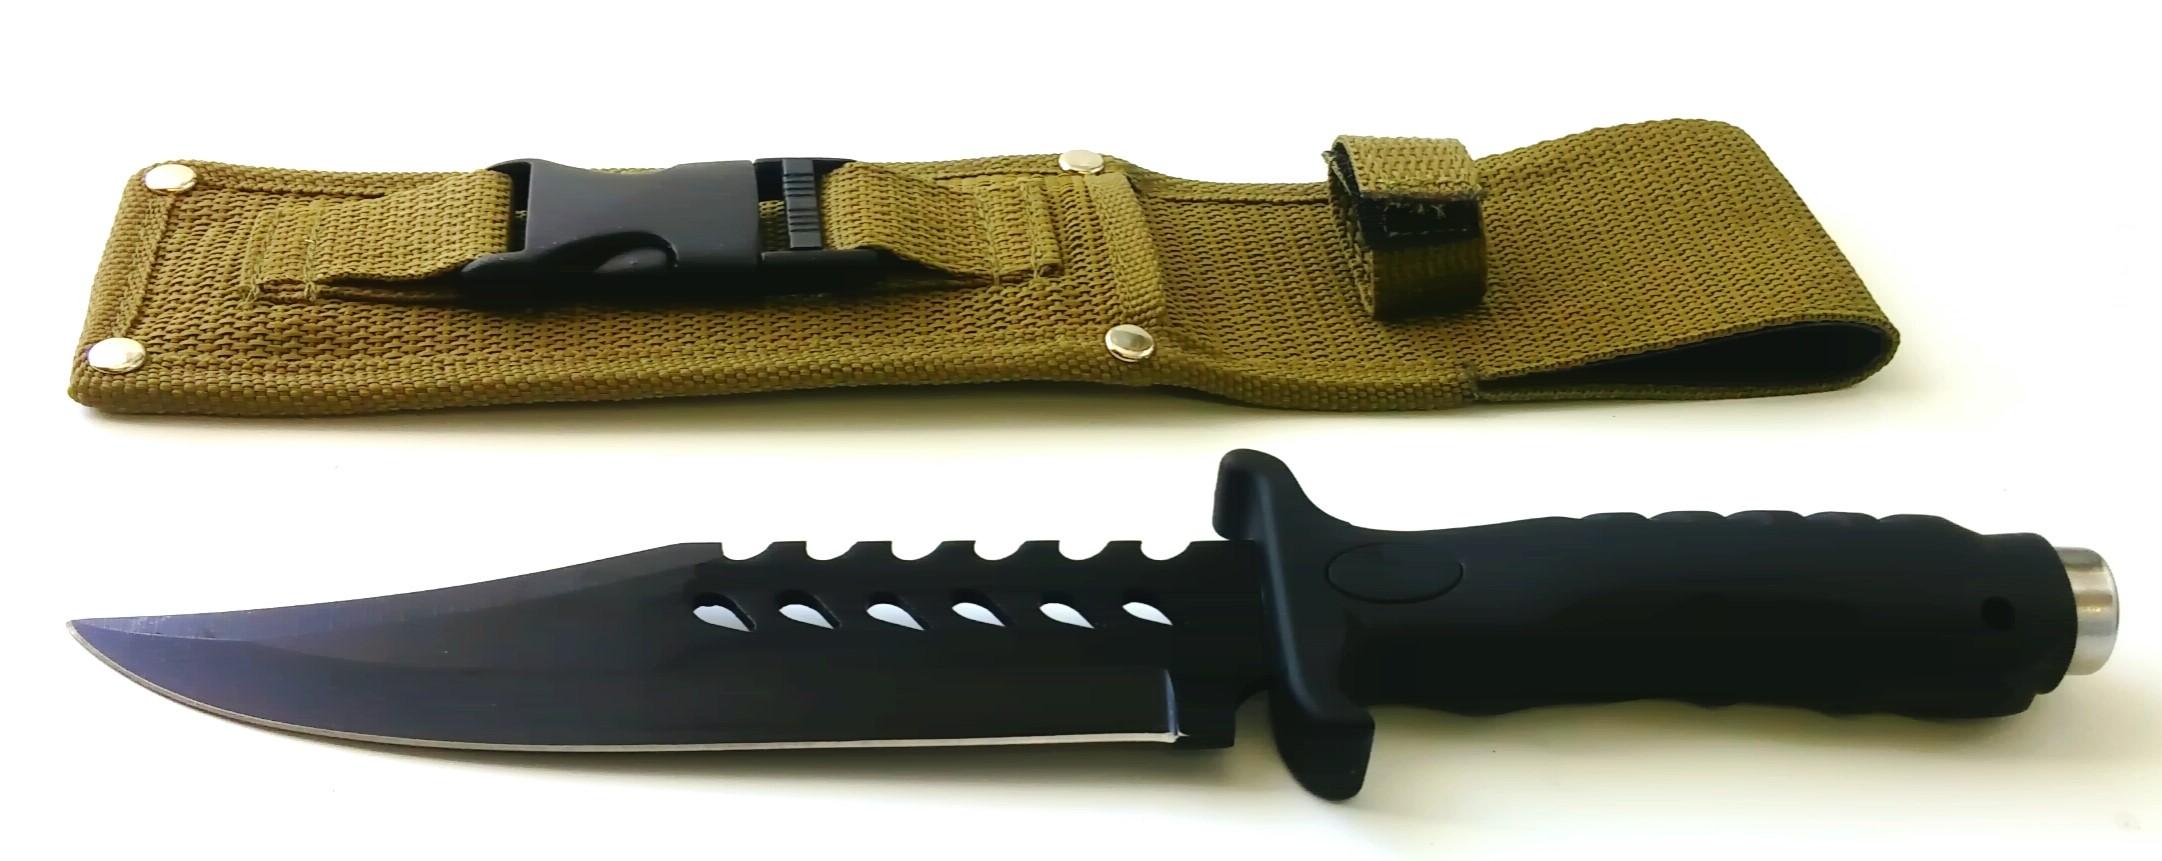 Survival knife 14164BK